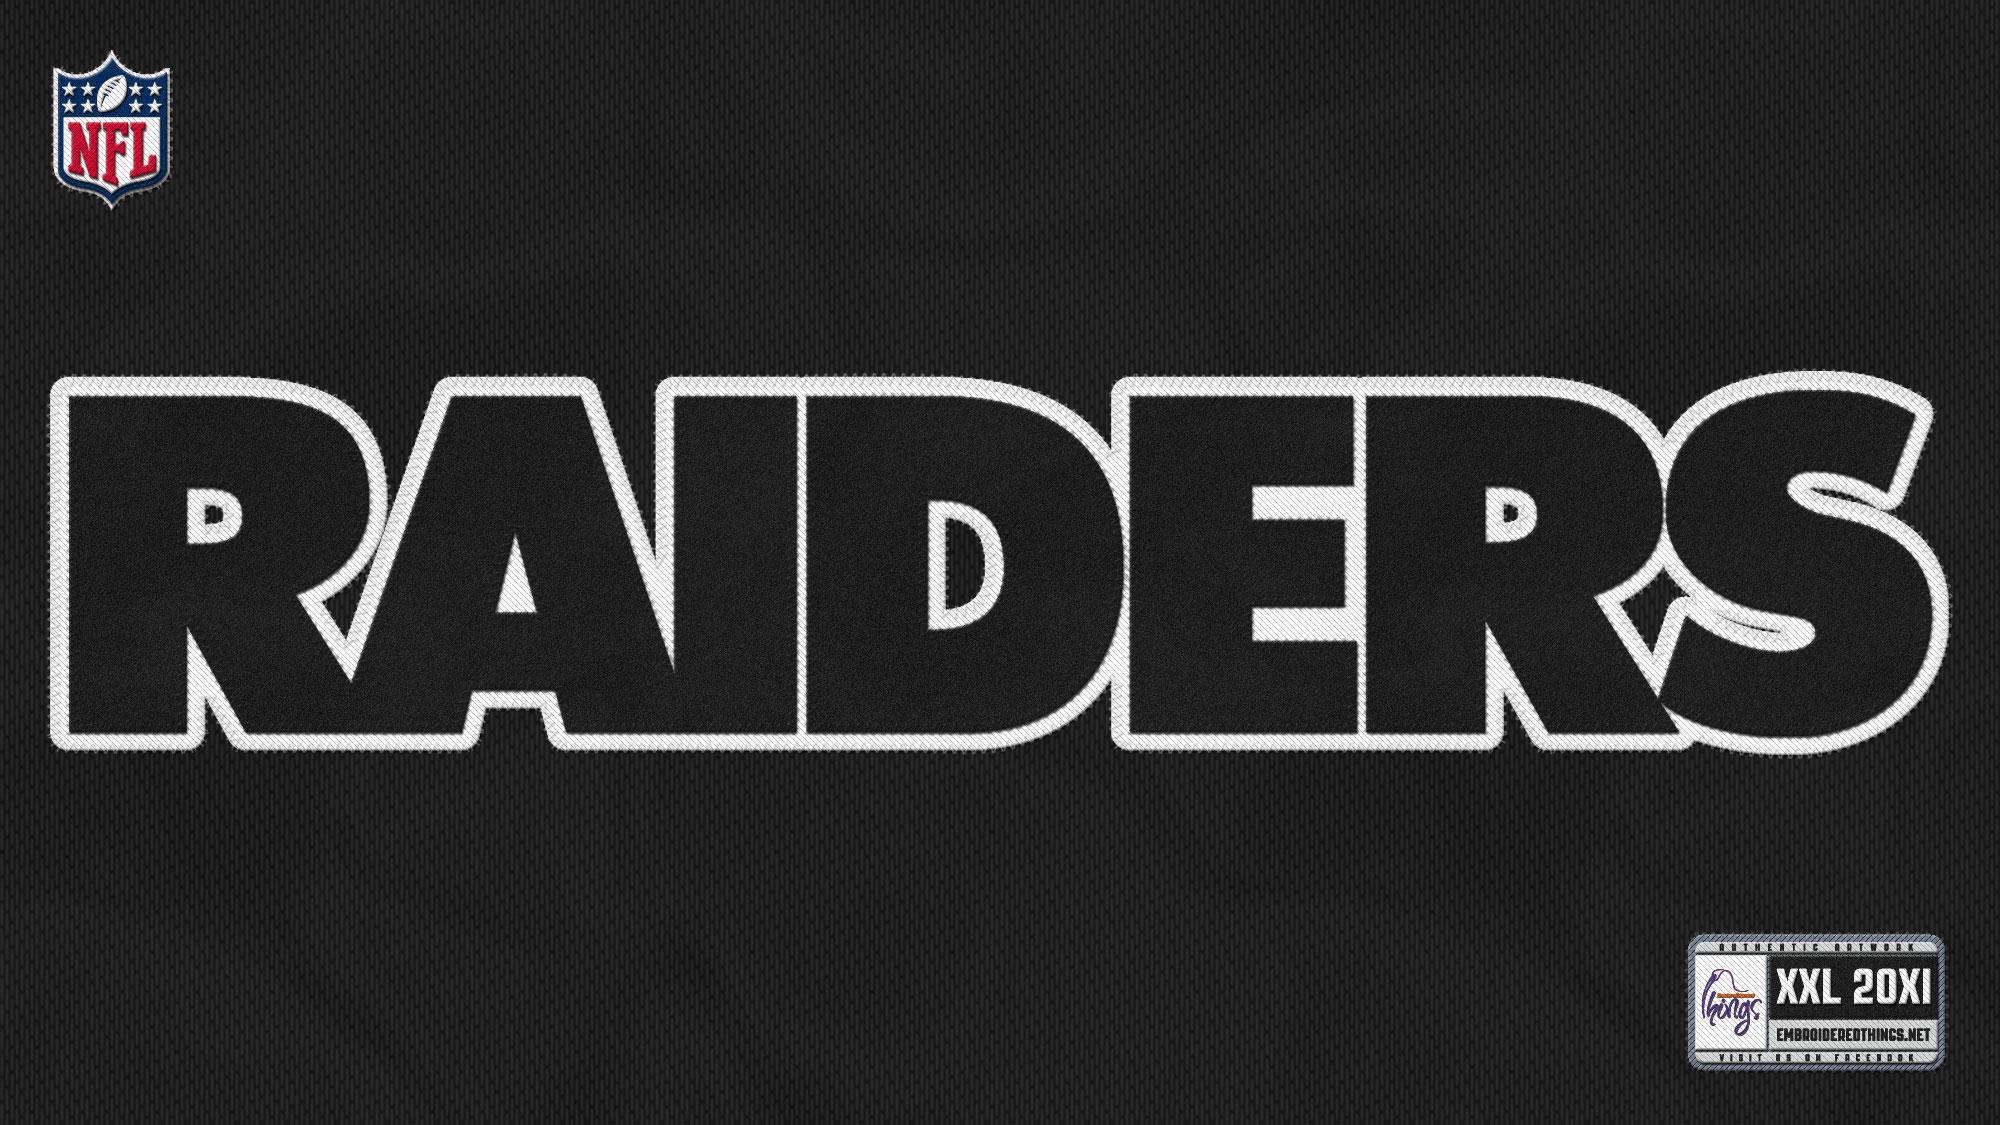 raiders wallpaper hd